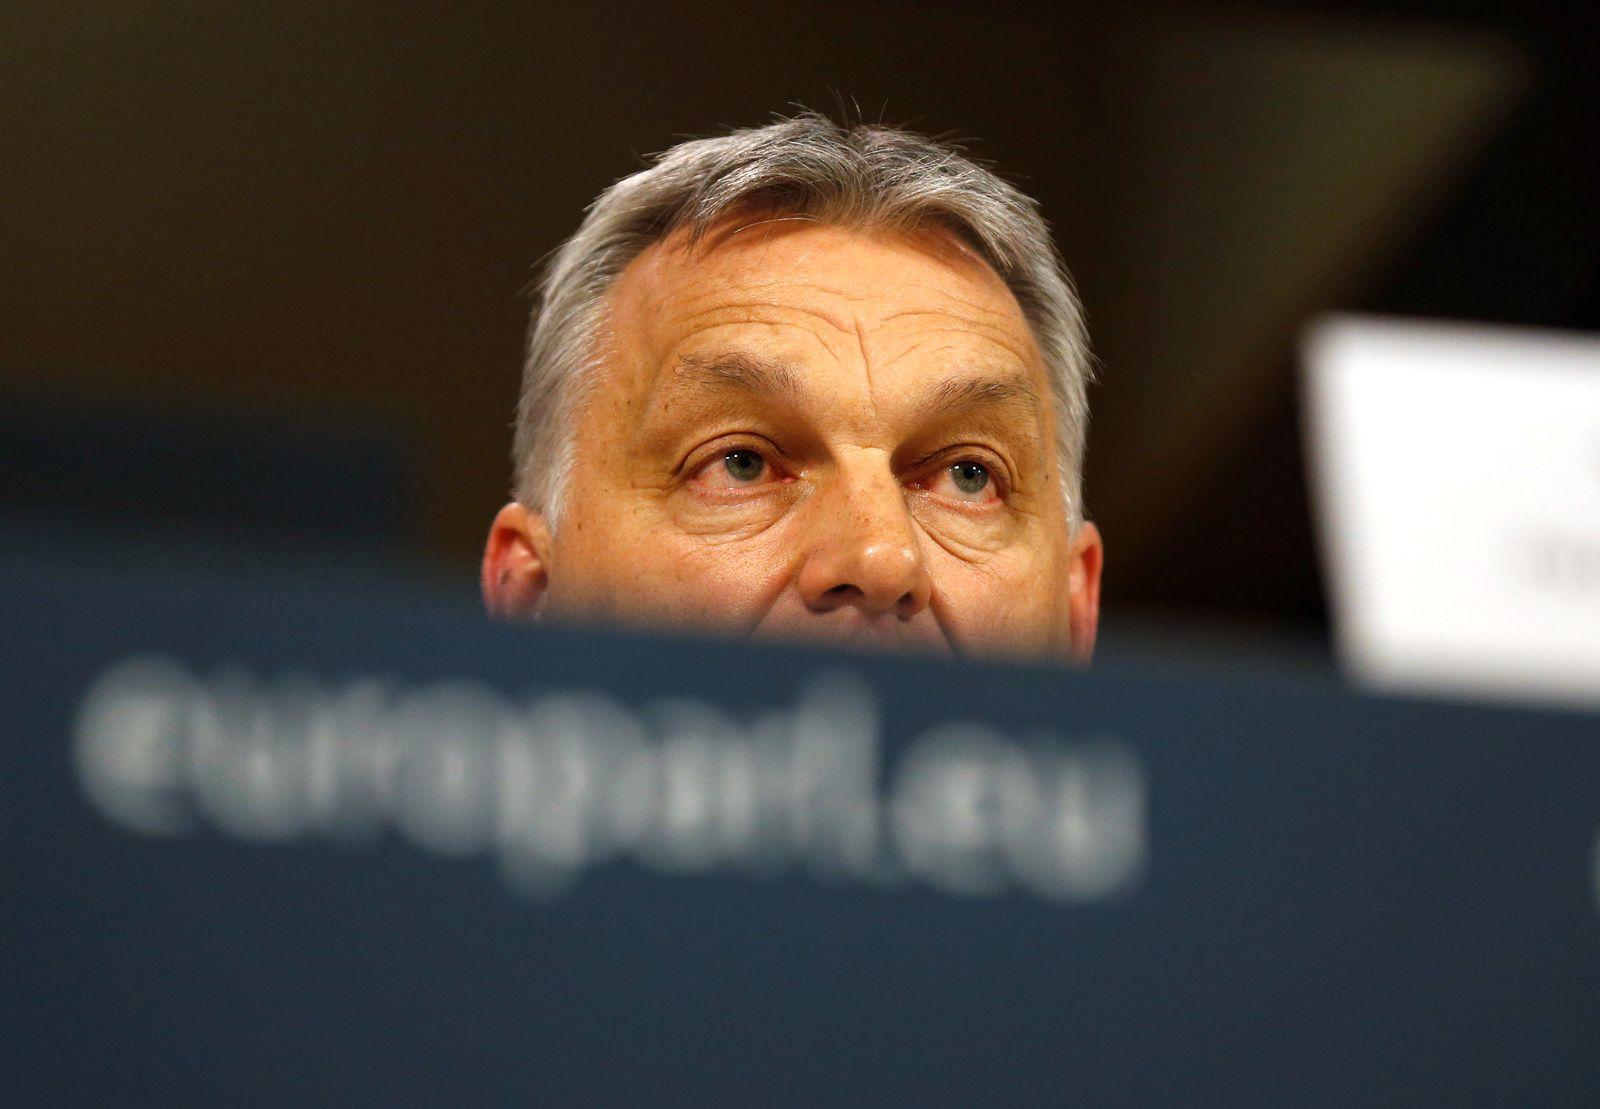 HUNGARY-EU/ORBAN